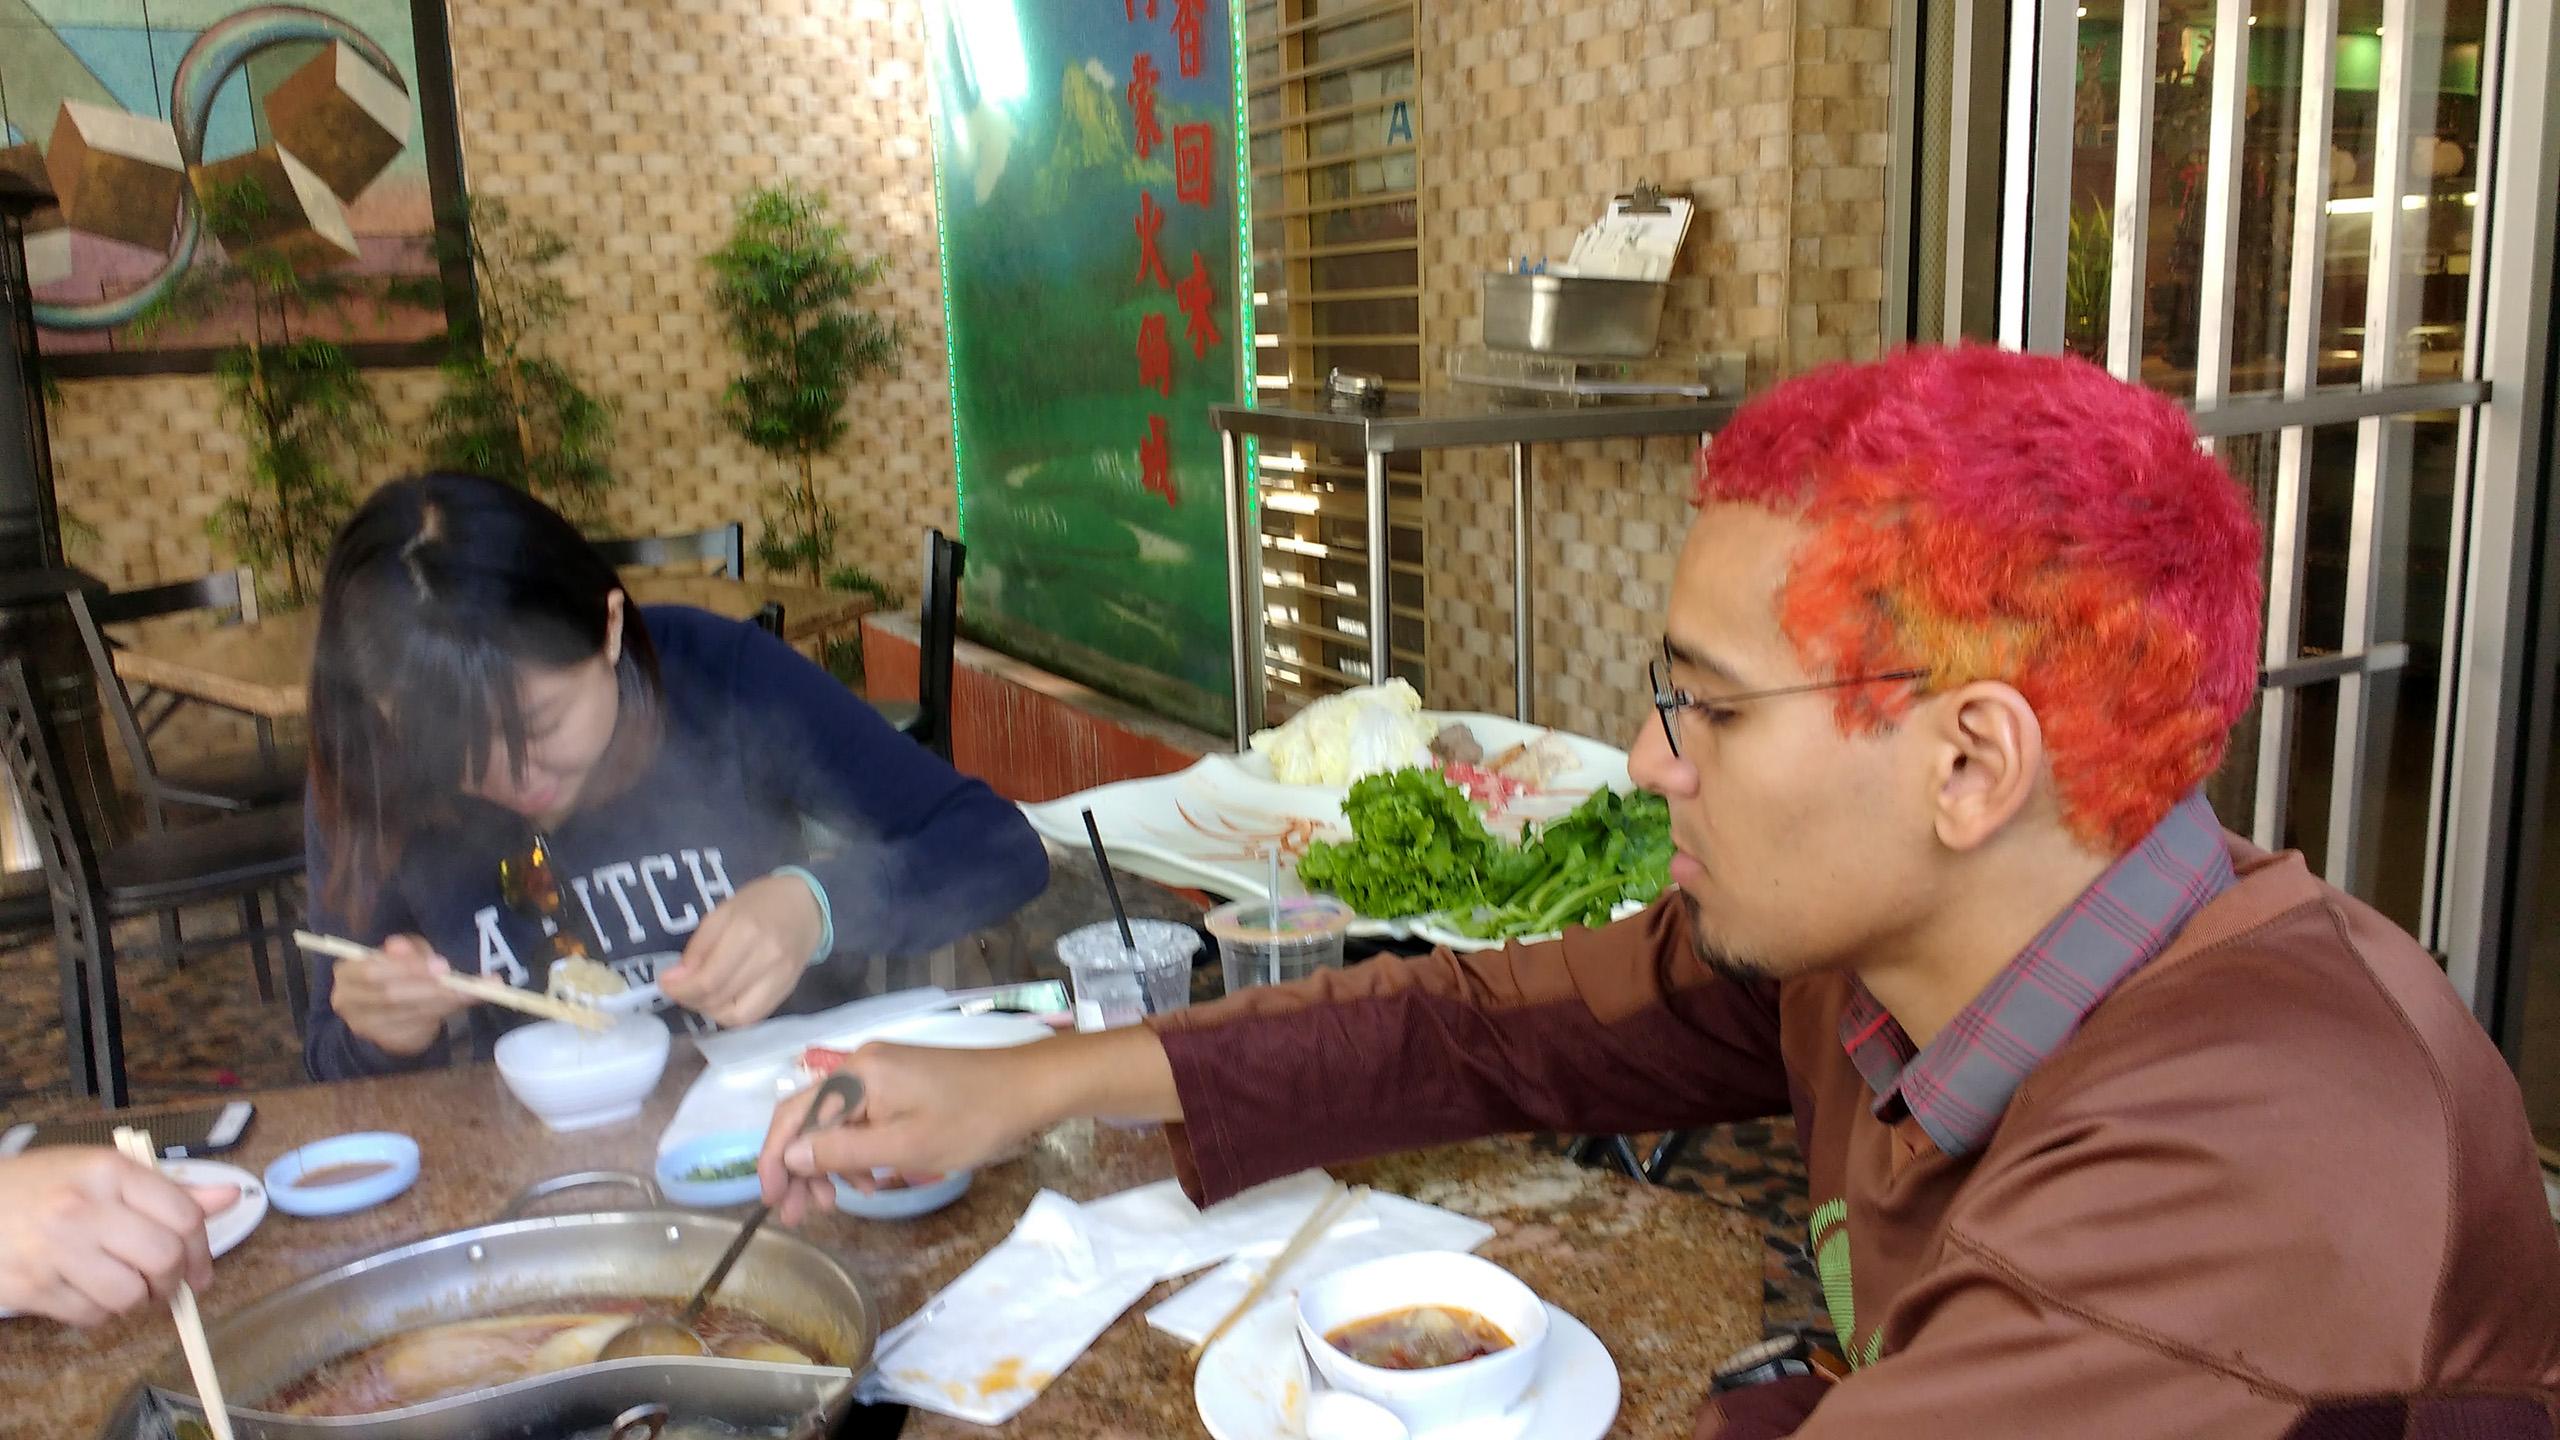 Ada and Samuel eating at Hot Pot City in New Taipei (San Gabriel, CA)